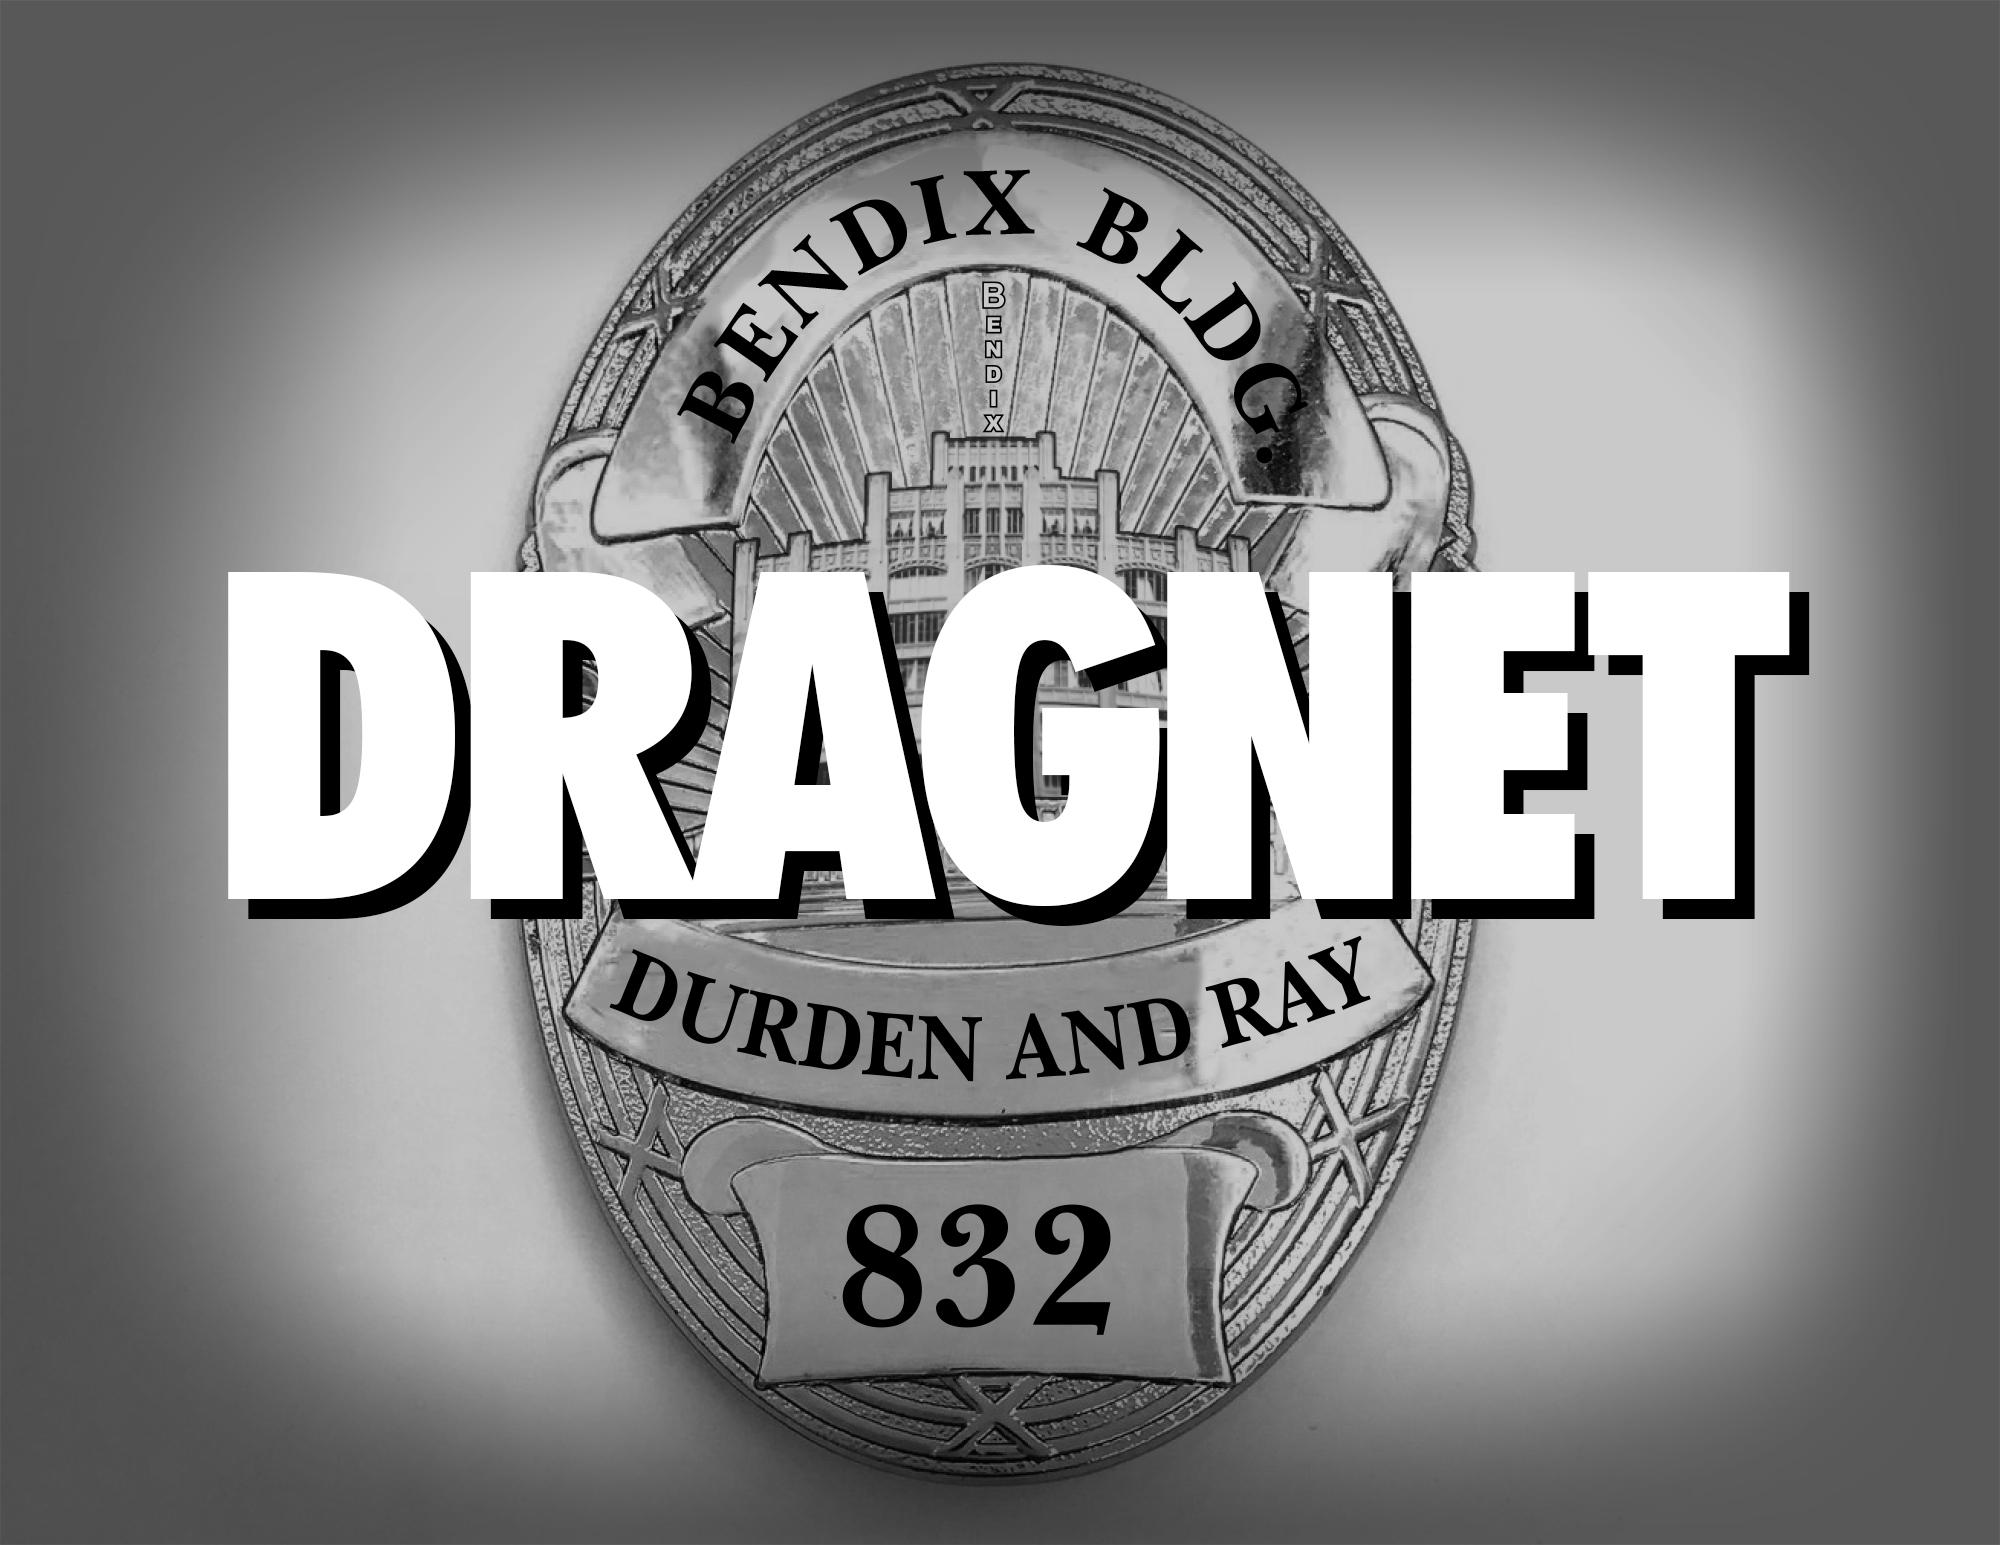 // Dragnet 832, art exhibit @Durden and Ray